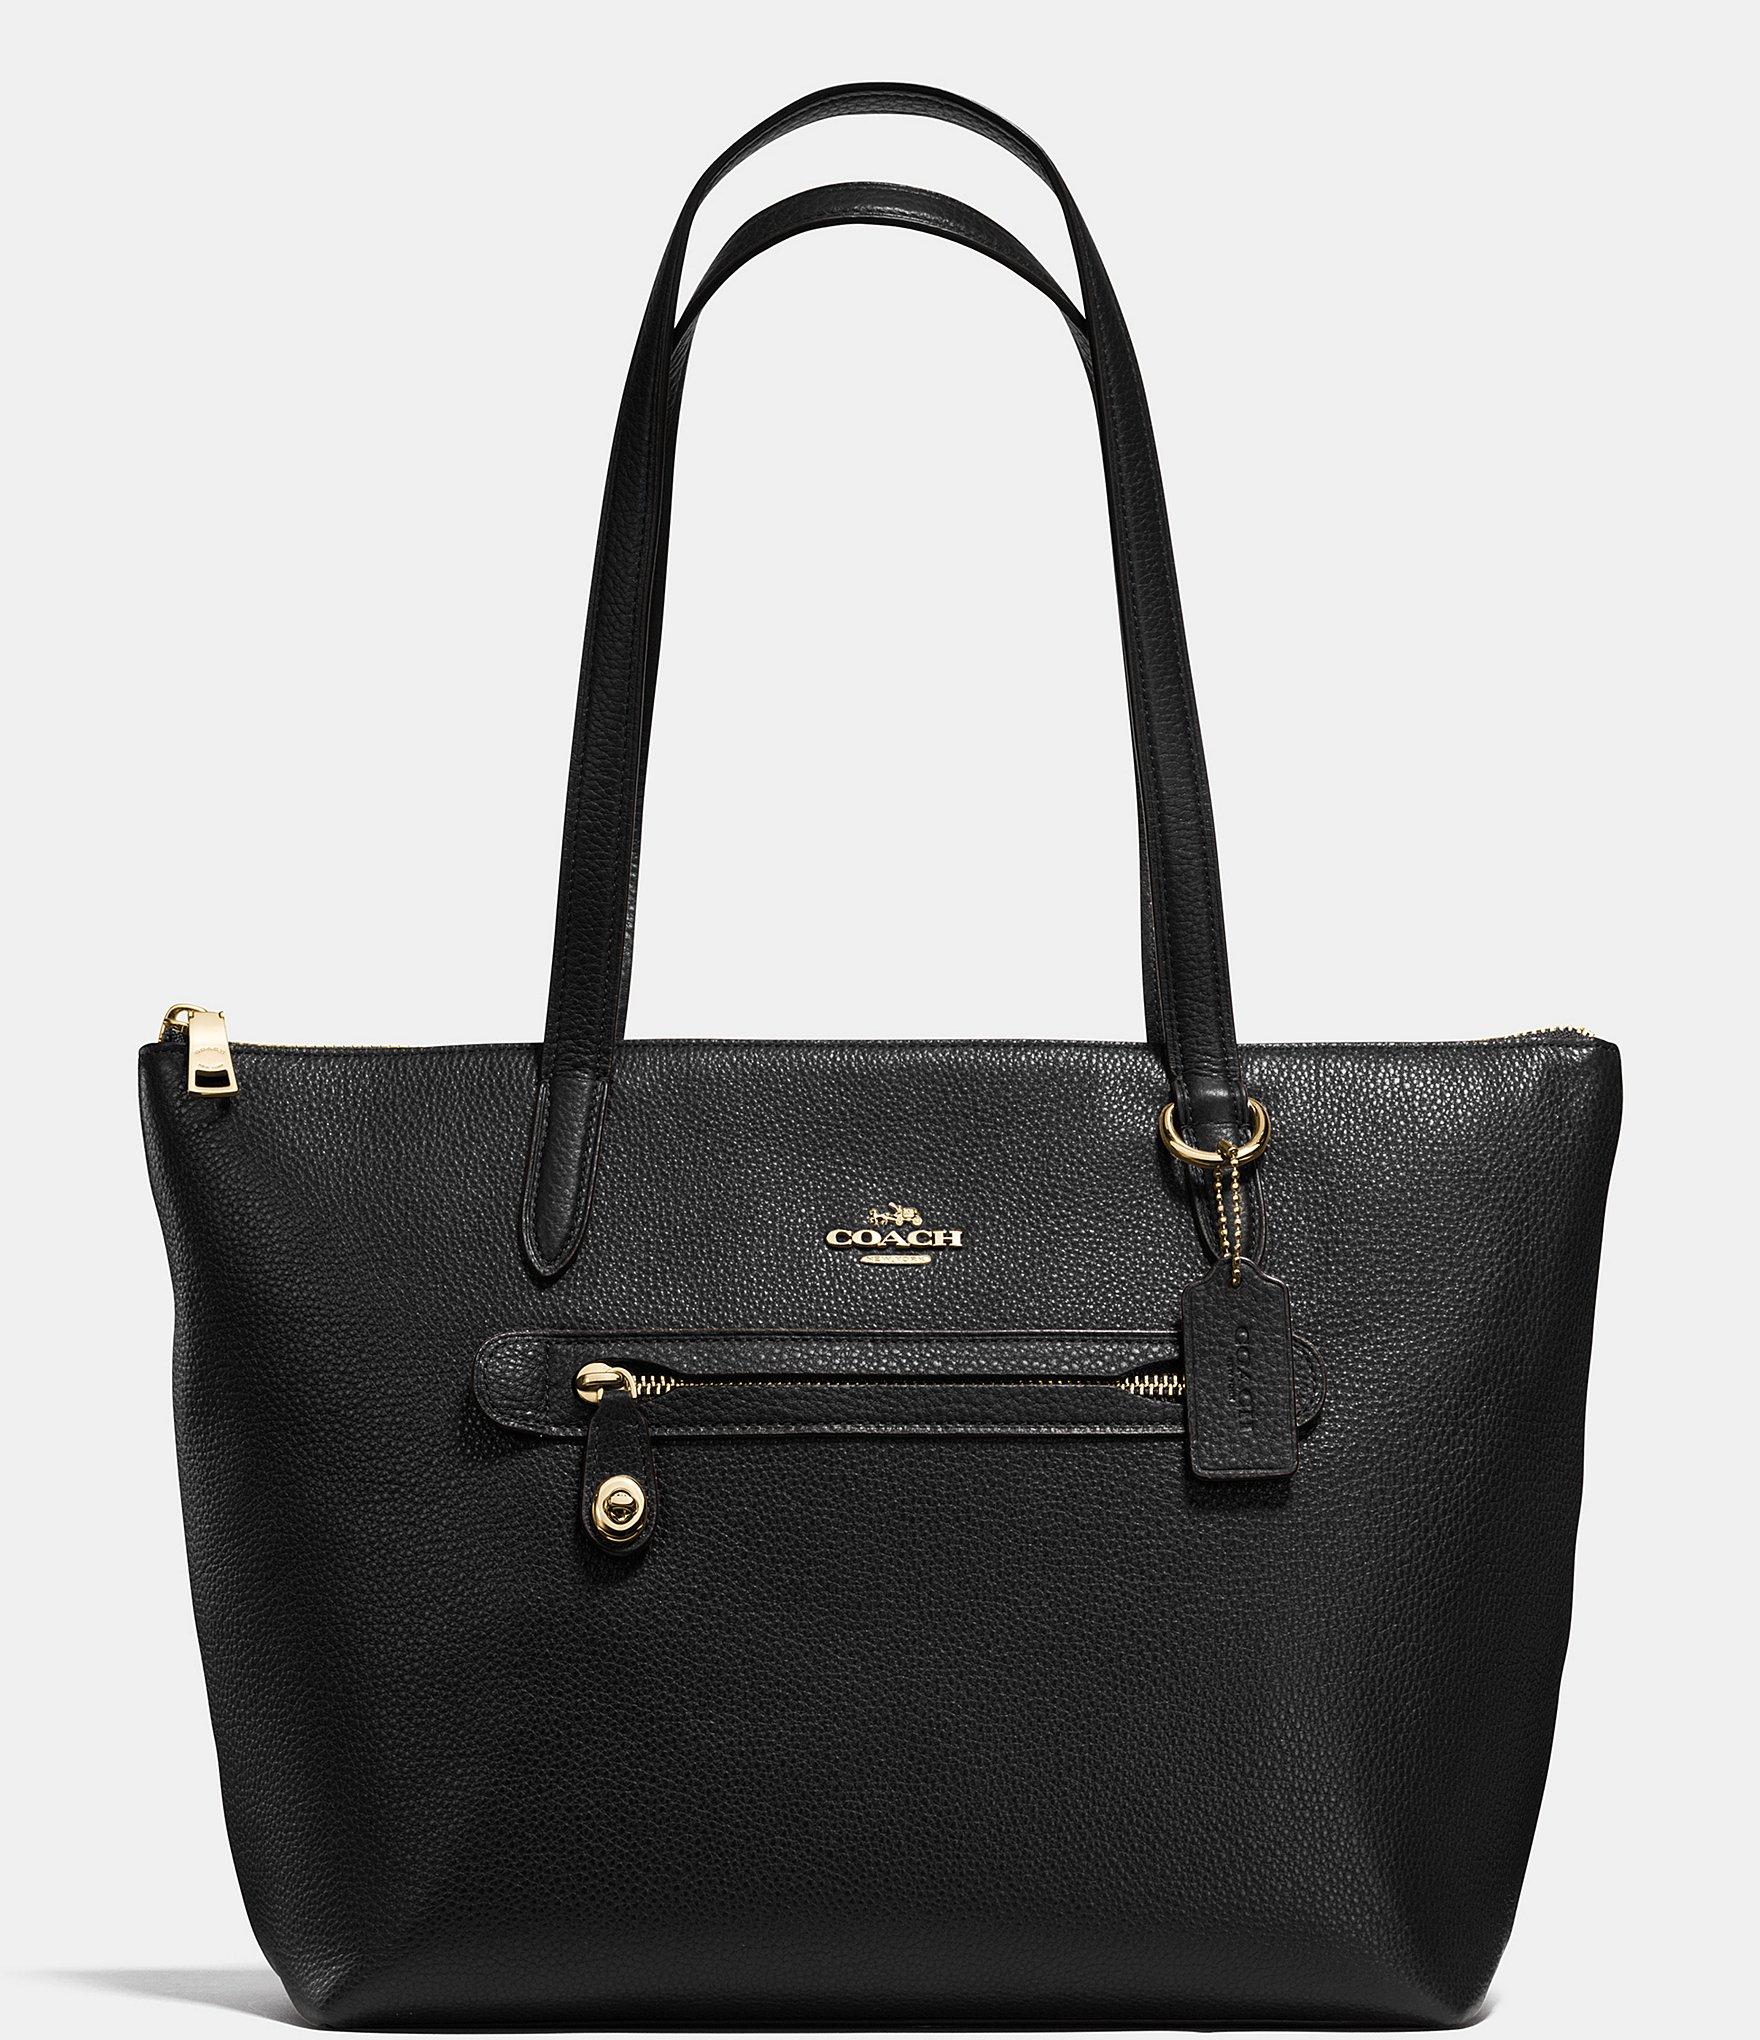 21688a6914 Handbags